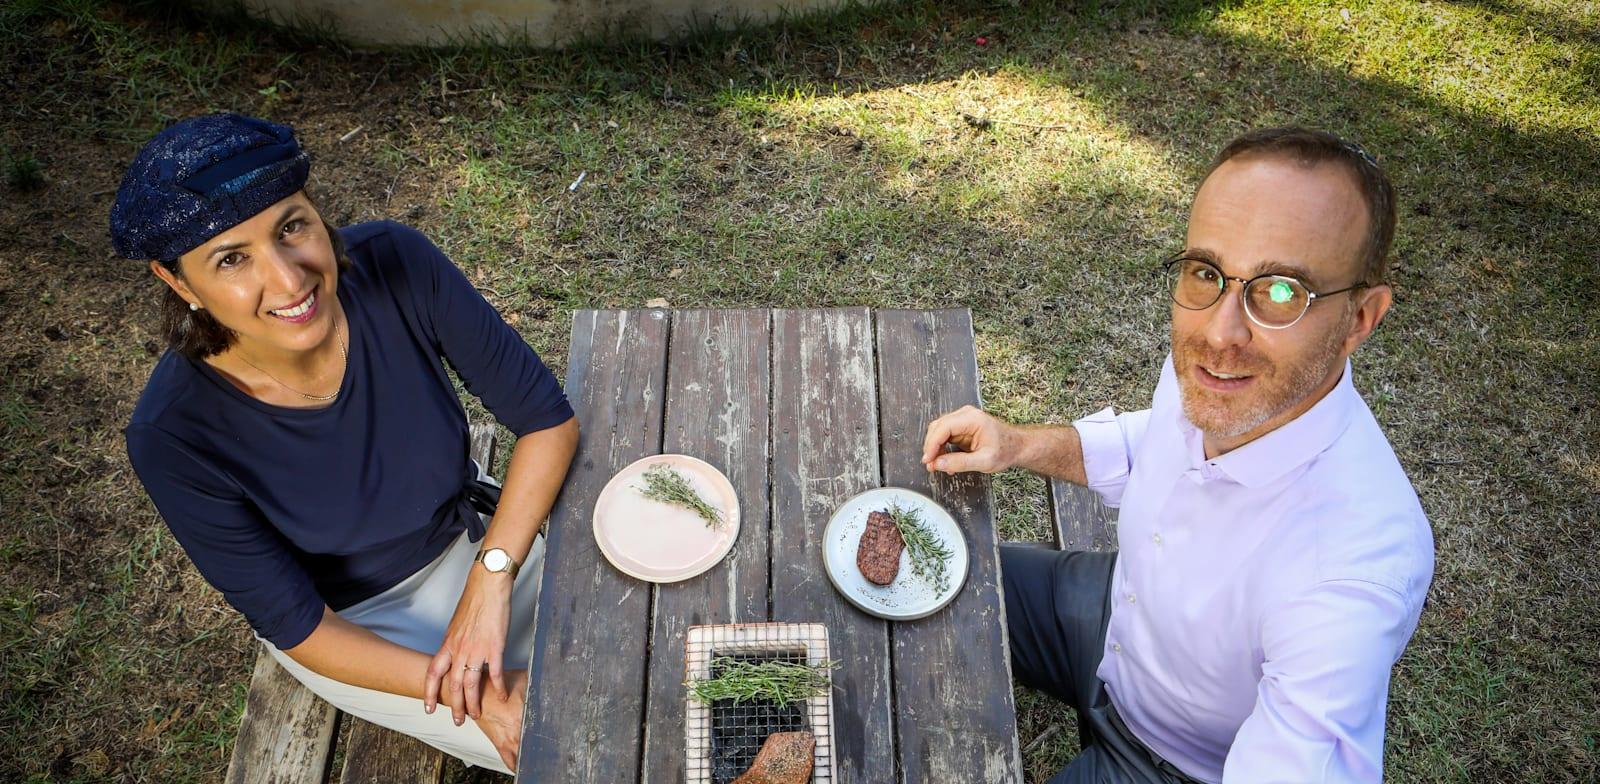 Shlomit Levenberg and Didier Toubier Photo: Shlomi Yosef